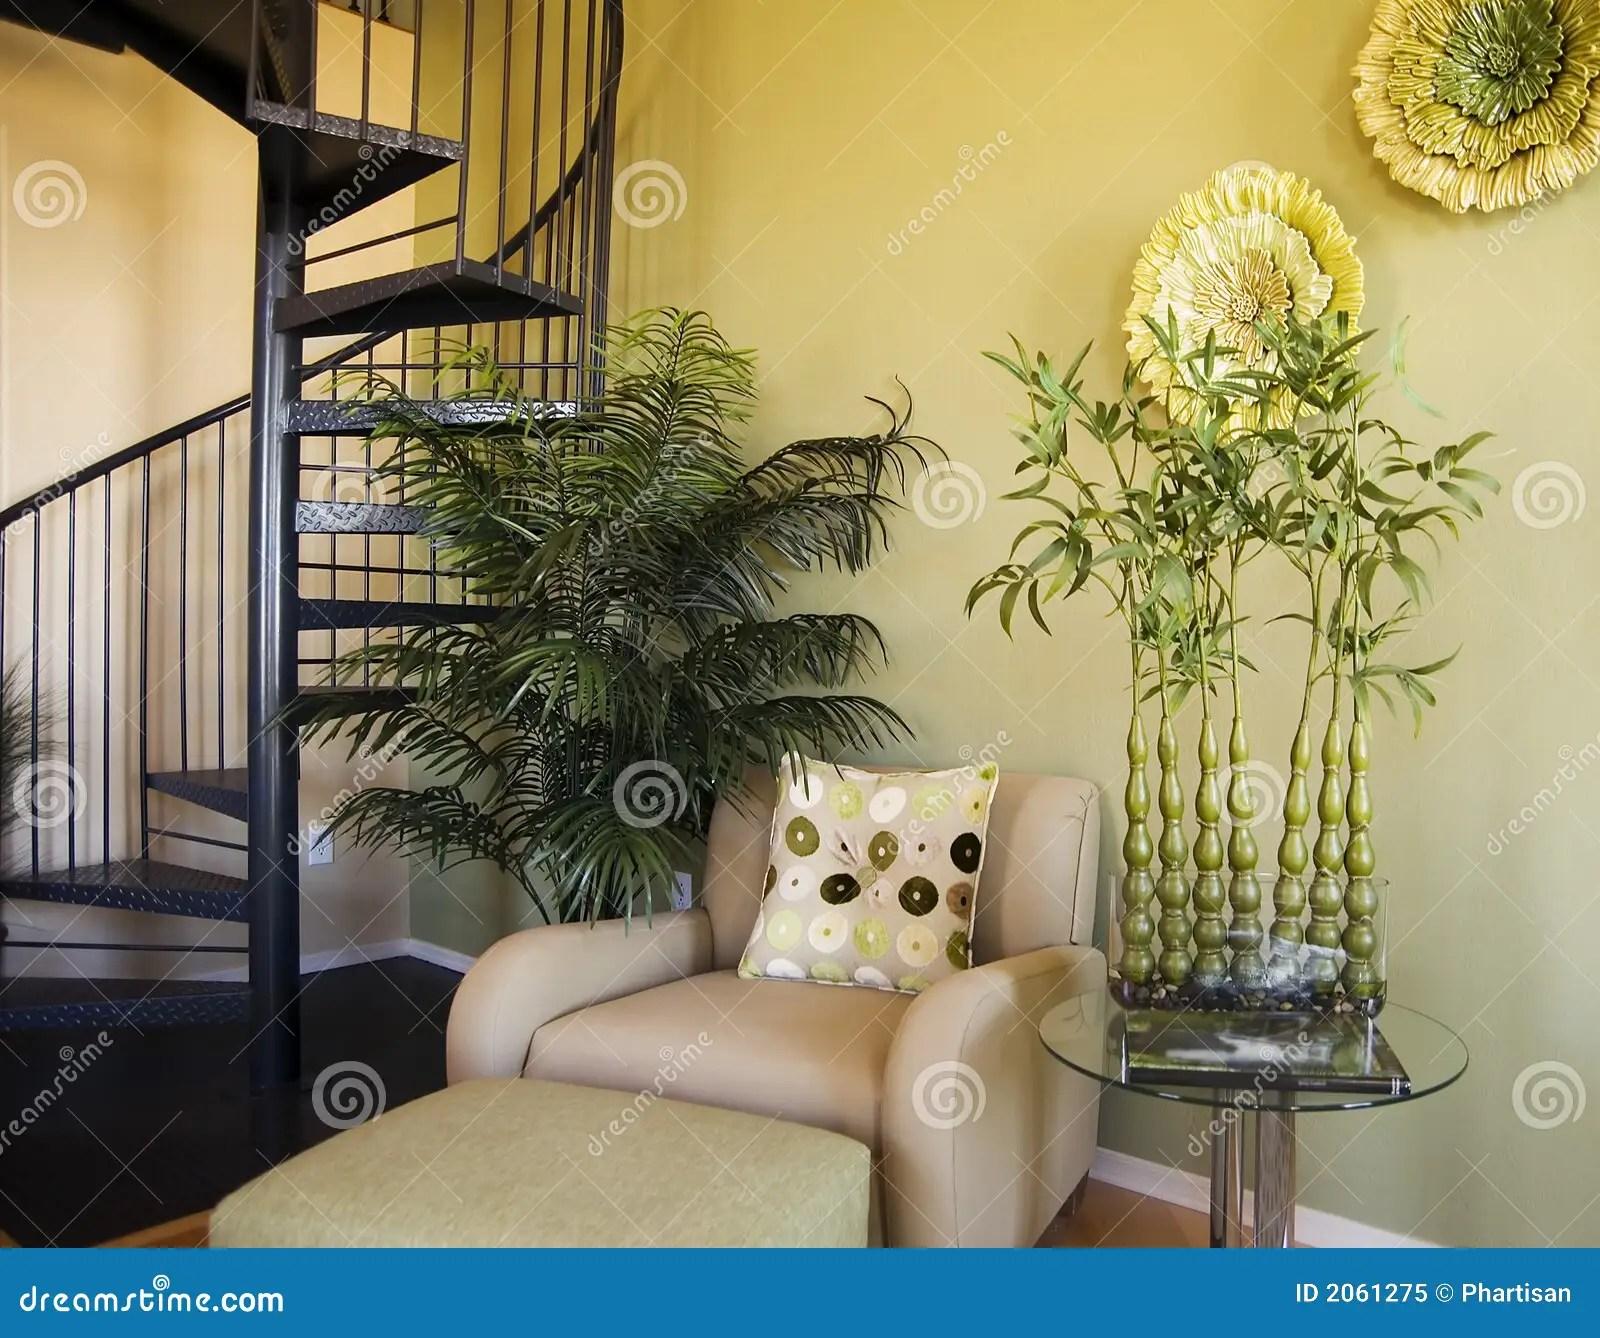 Home interior design raleigh - Model Home Interiors Raleigh Nc Model Home Interiors Images